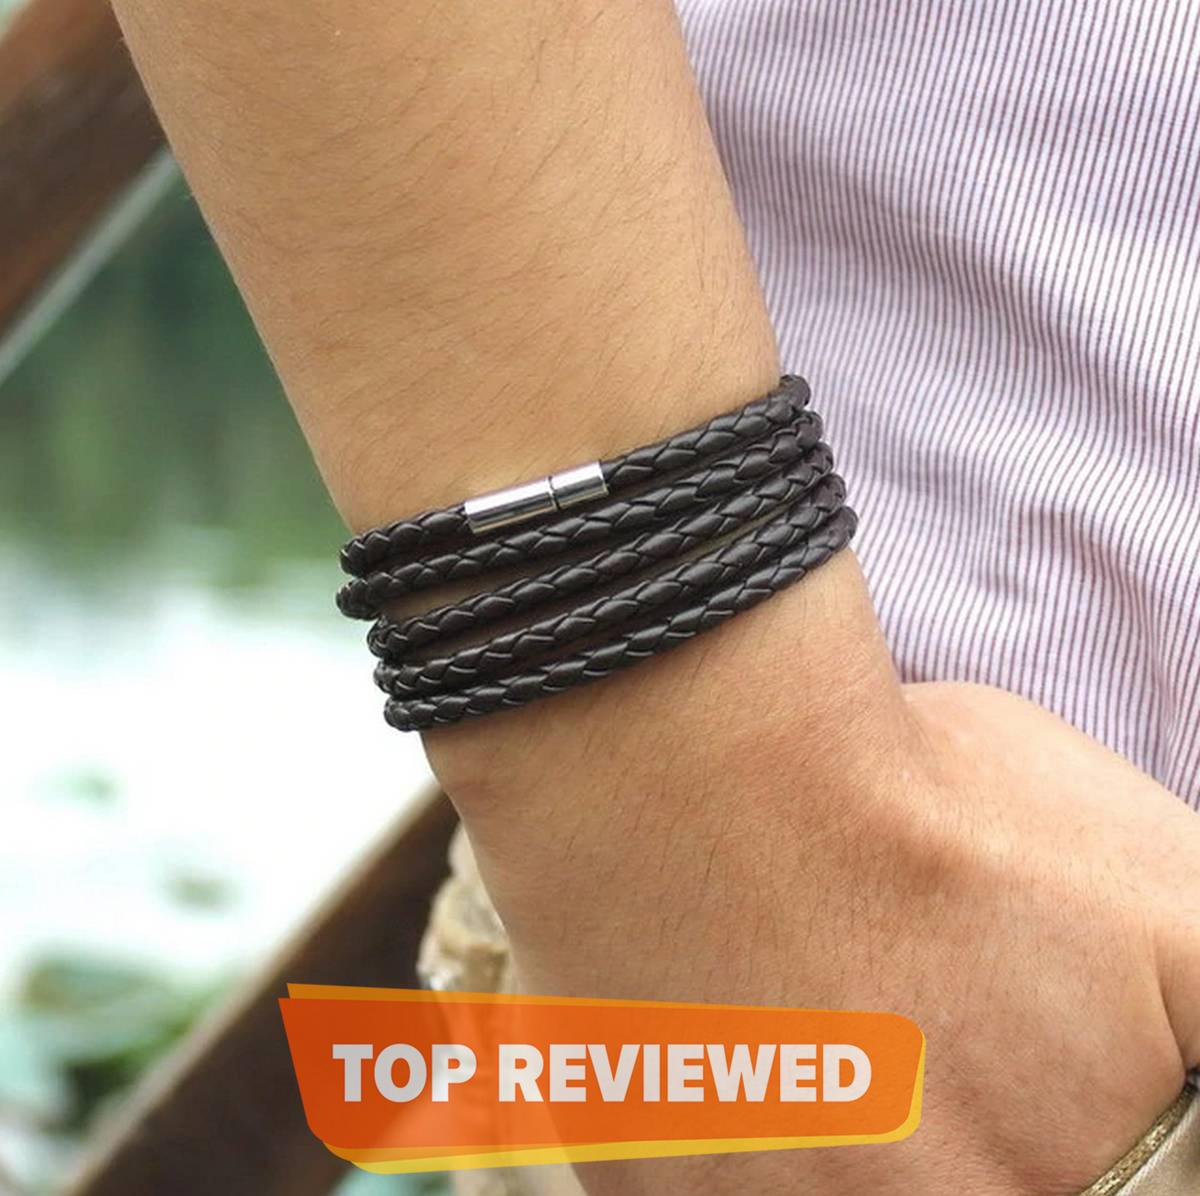 Jet Black PU Leather Rolo Chain Bracelet - TM-MB-15